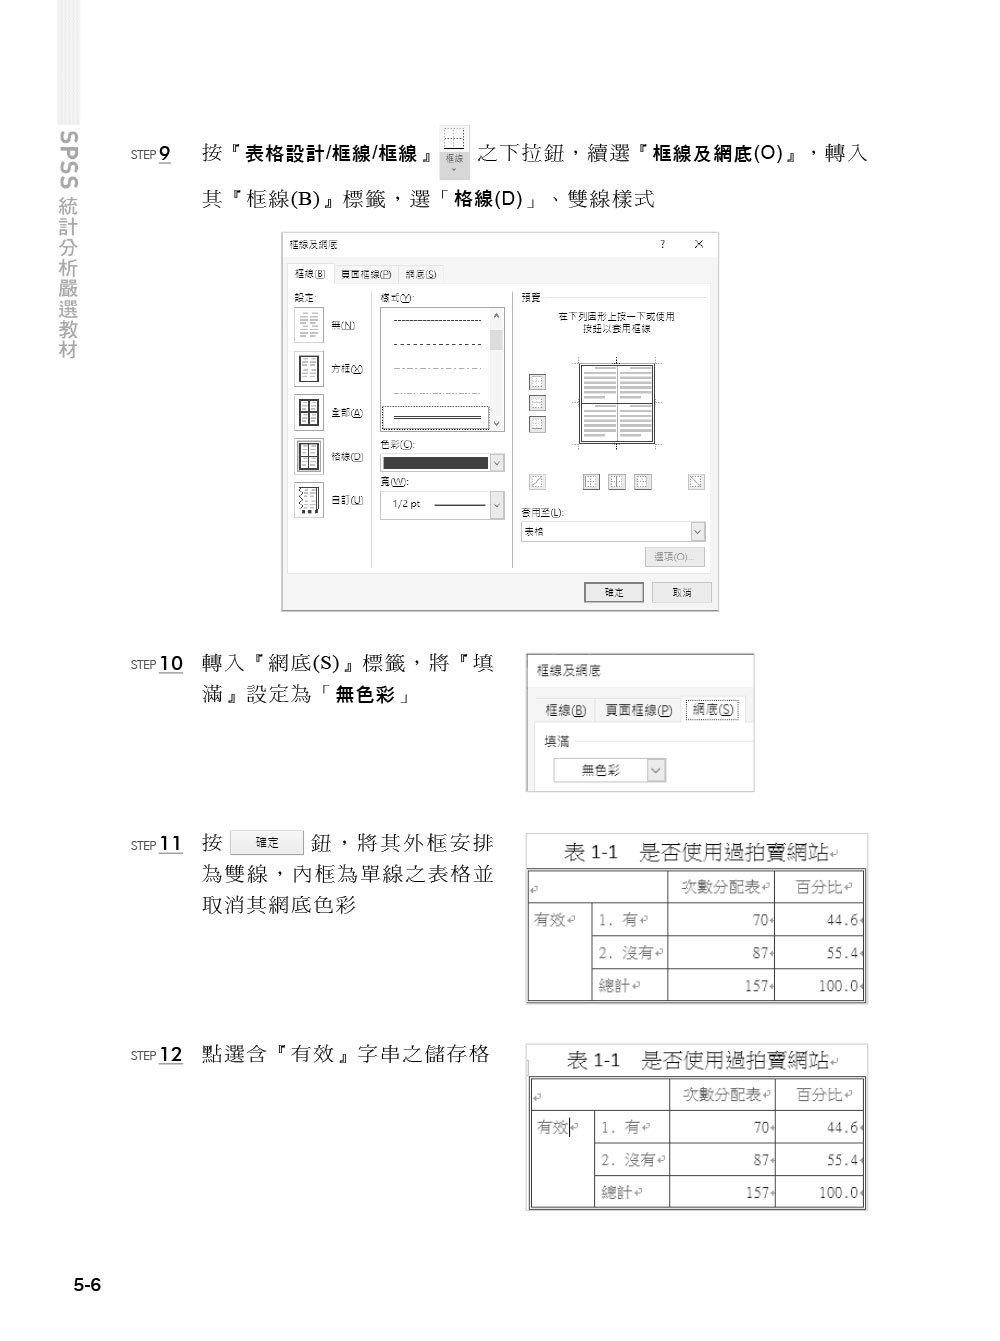 SPSS 26 統計分析嚴選教材 (適用SPSS 26~22) | 天瓏網路書店